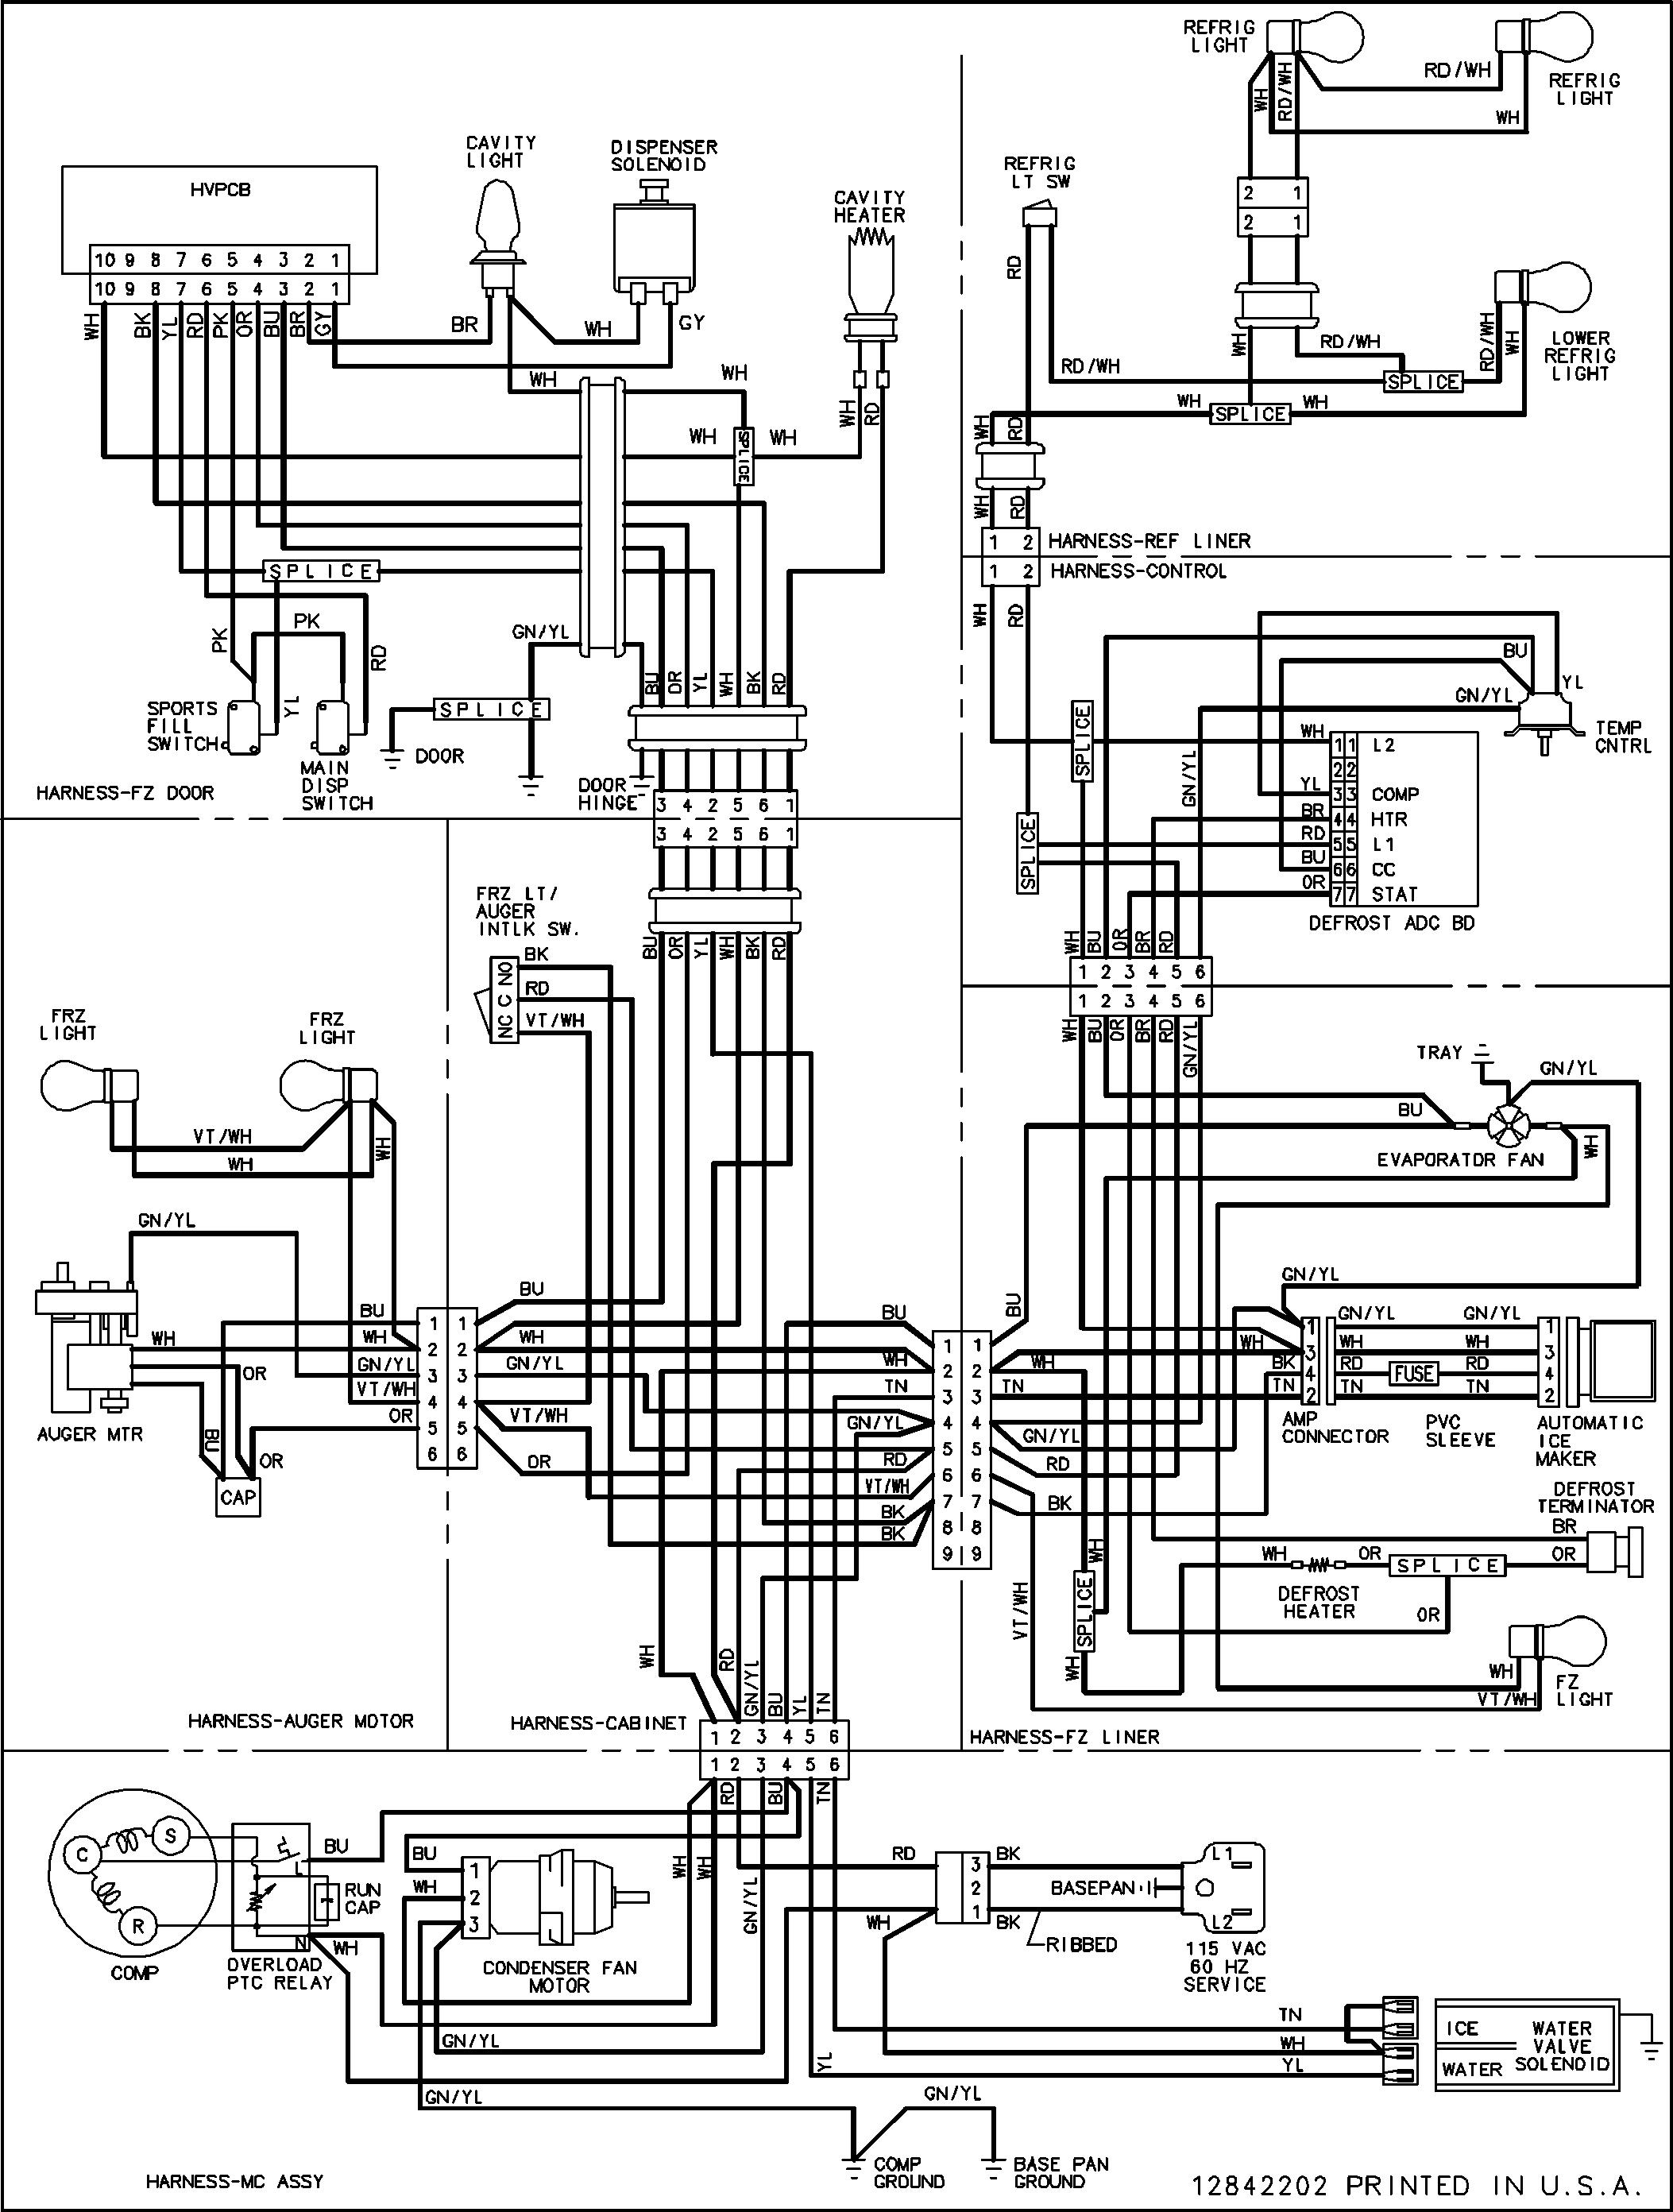 Maytag Dryer Wiring Diagram Together